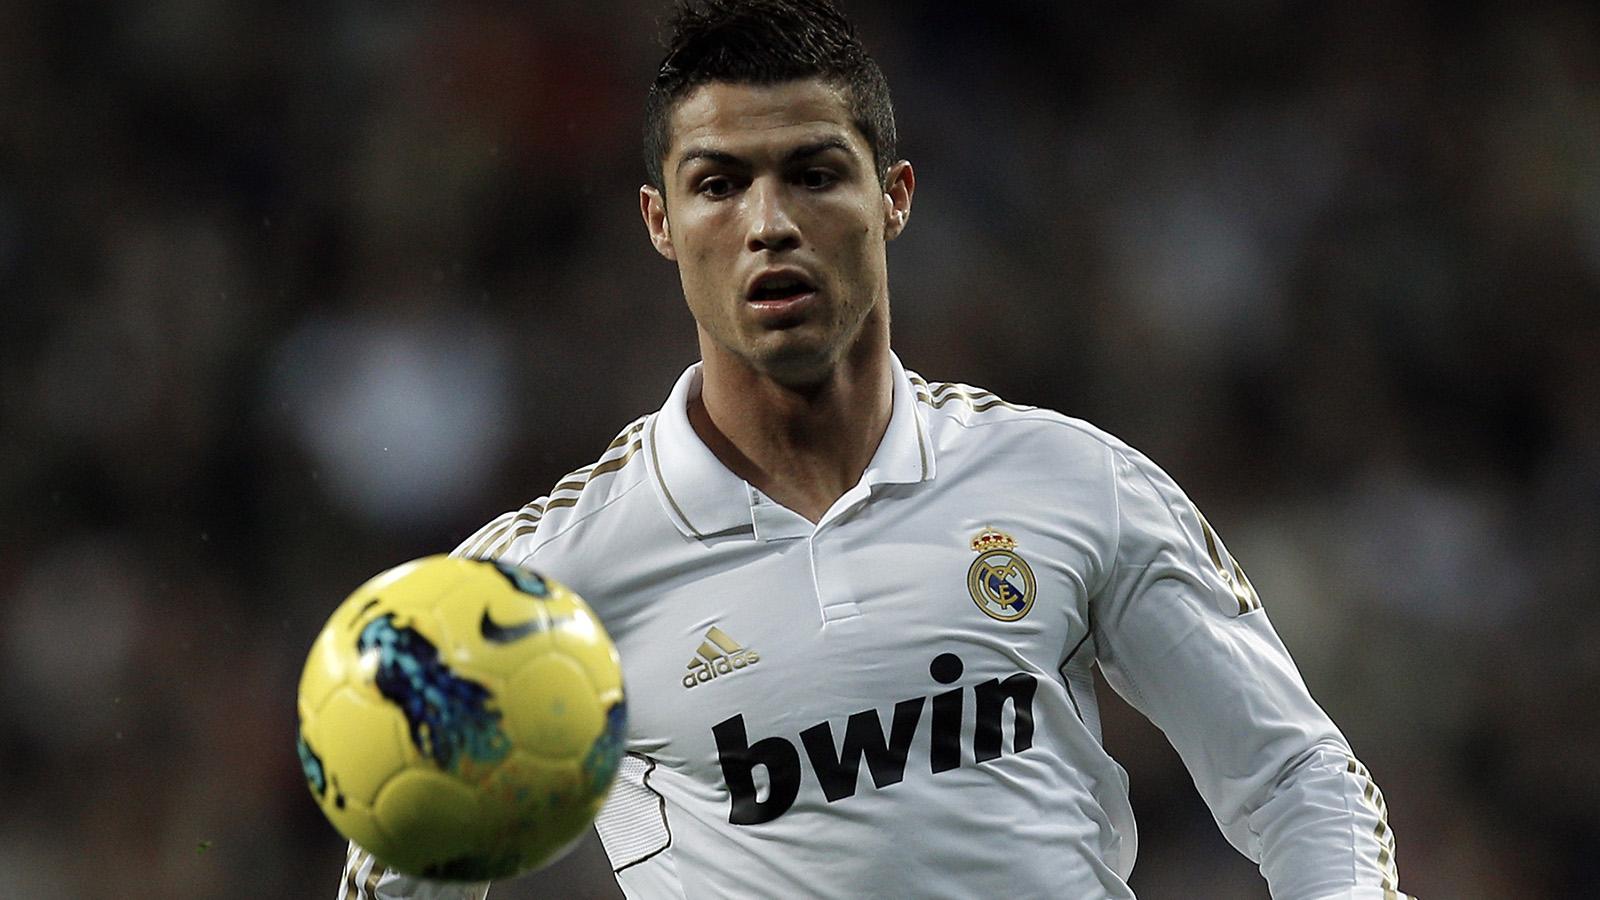 Sport Wallpaper Real Madrid: Wallpaper For Desktop, Laptop